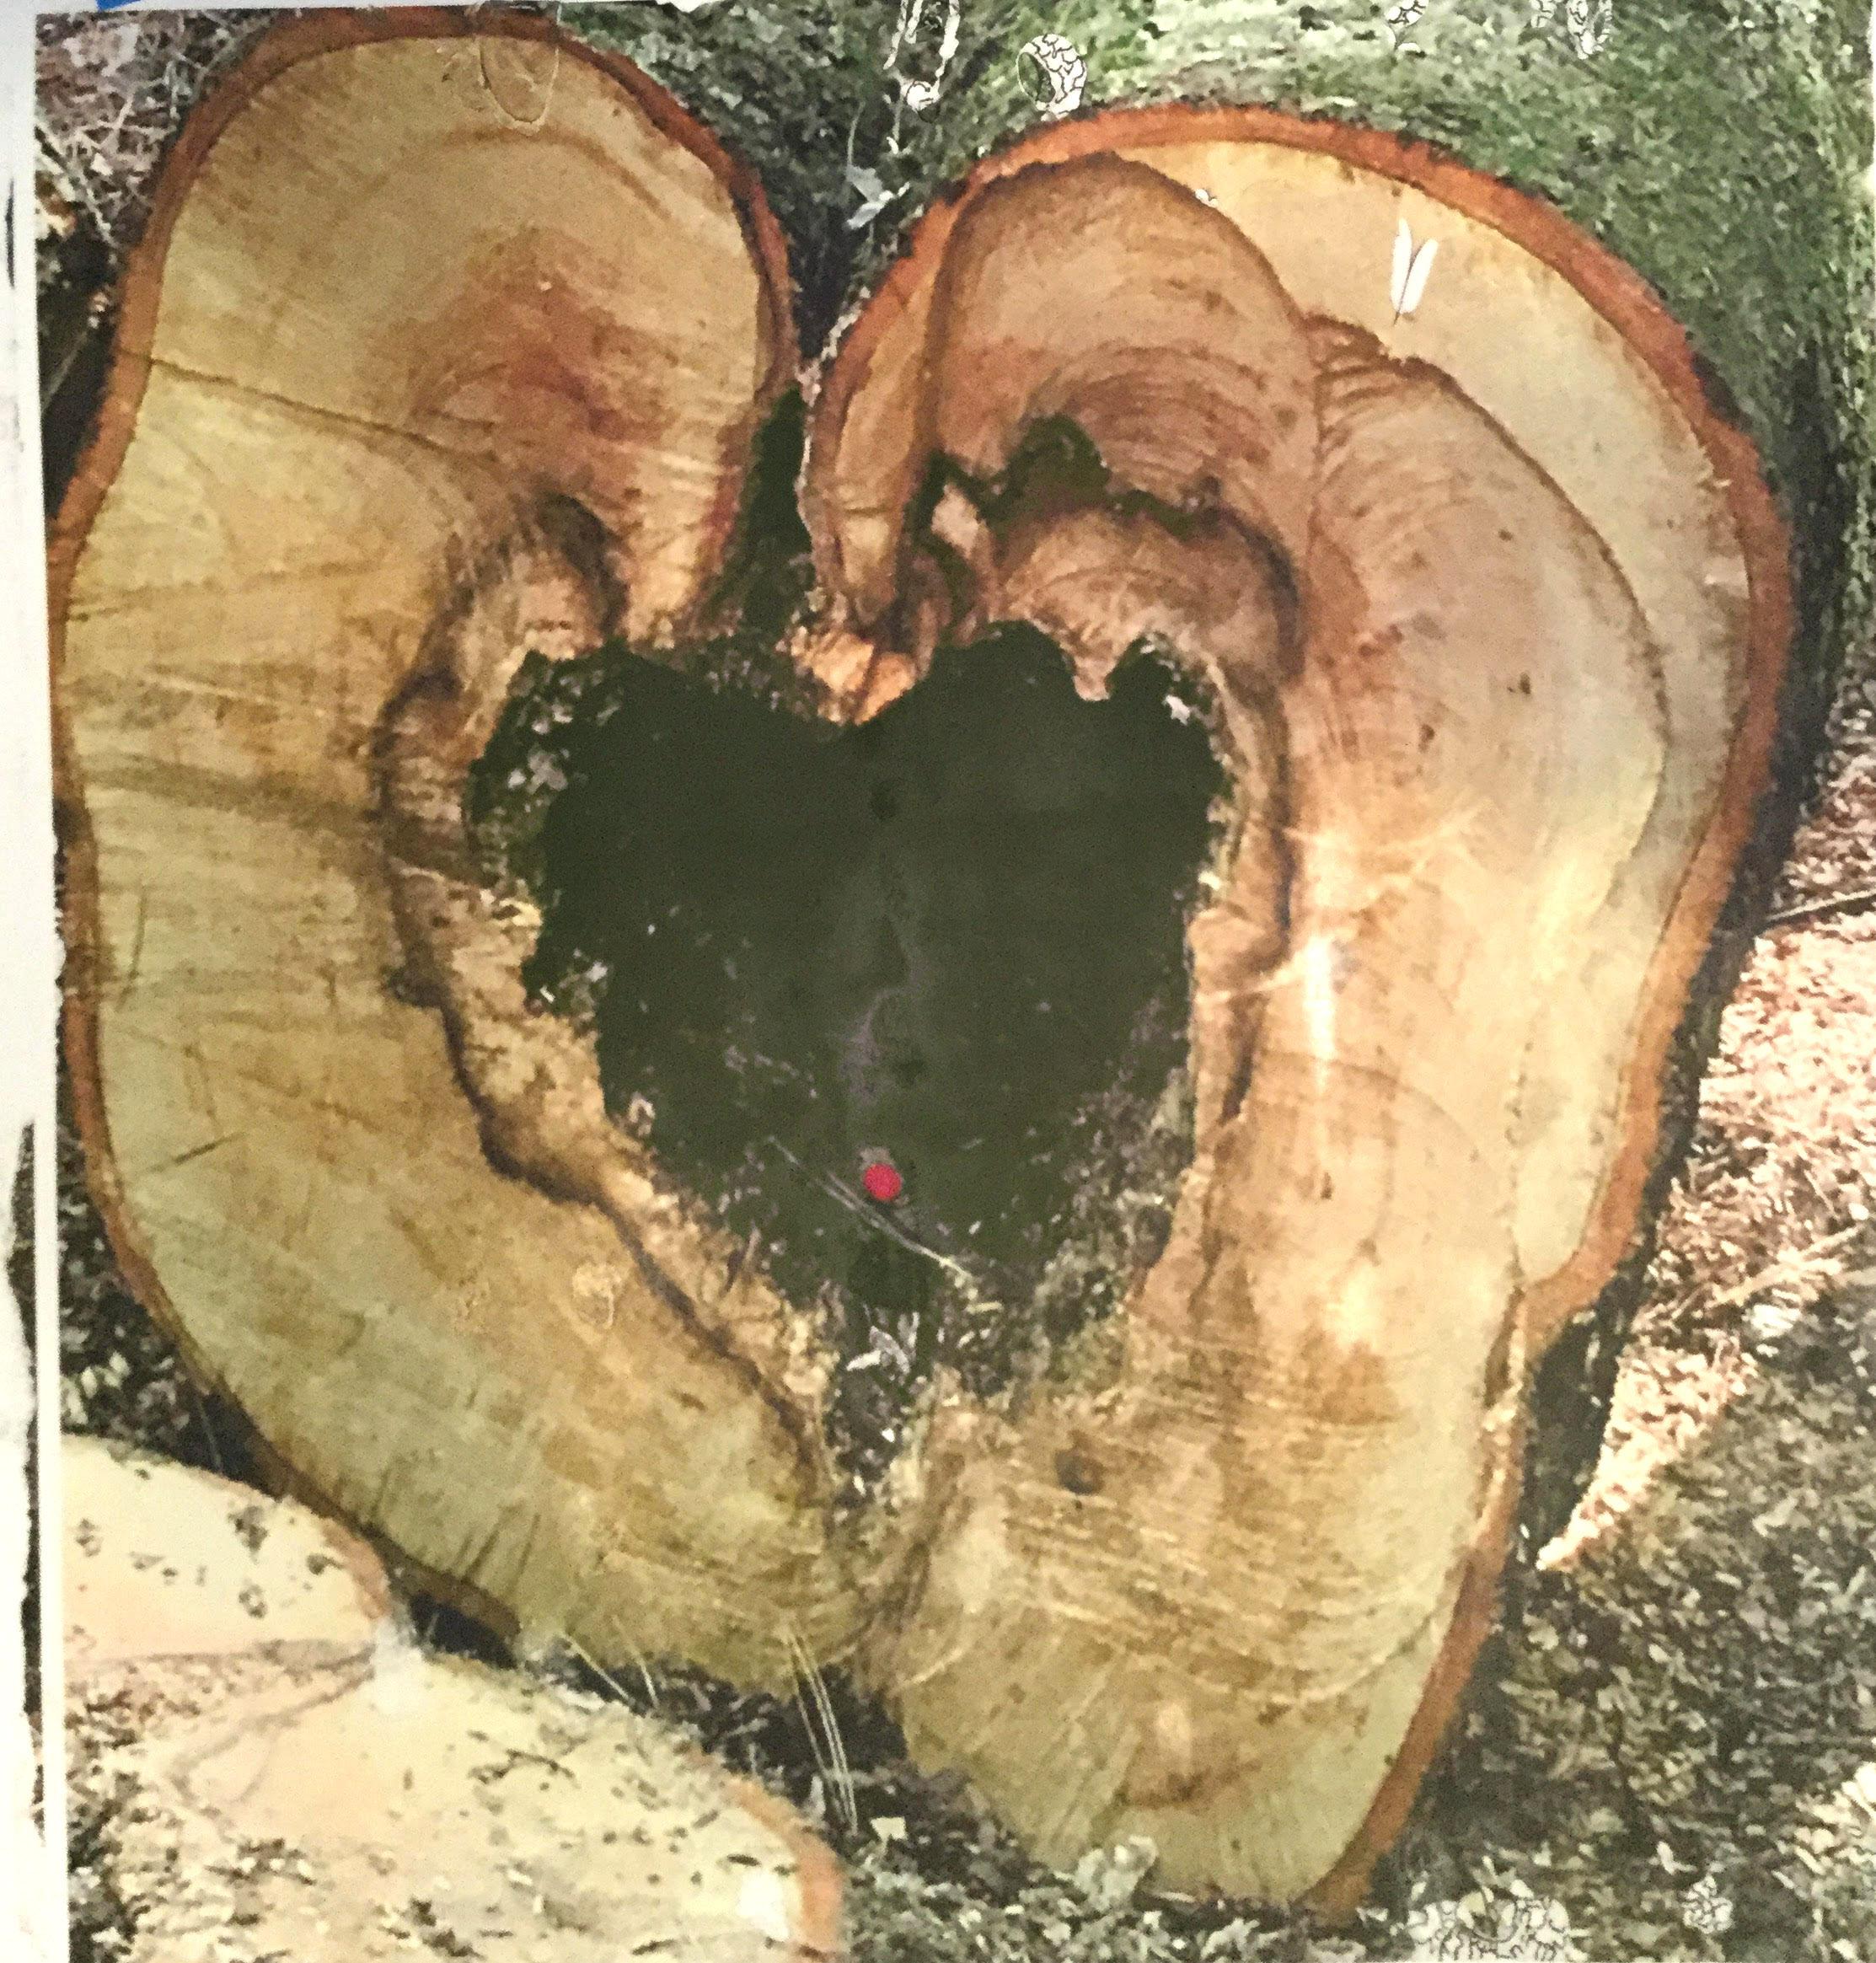 Telltale Heart